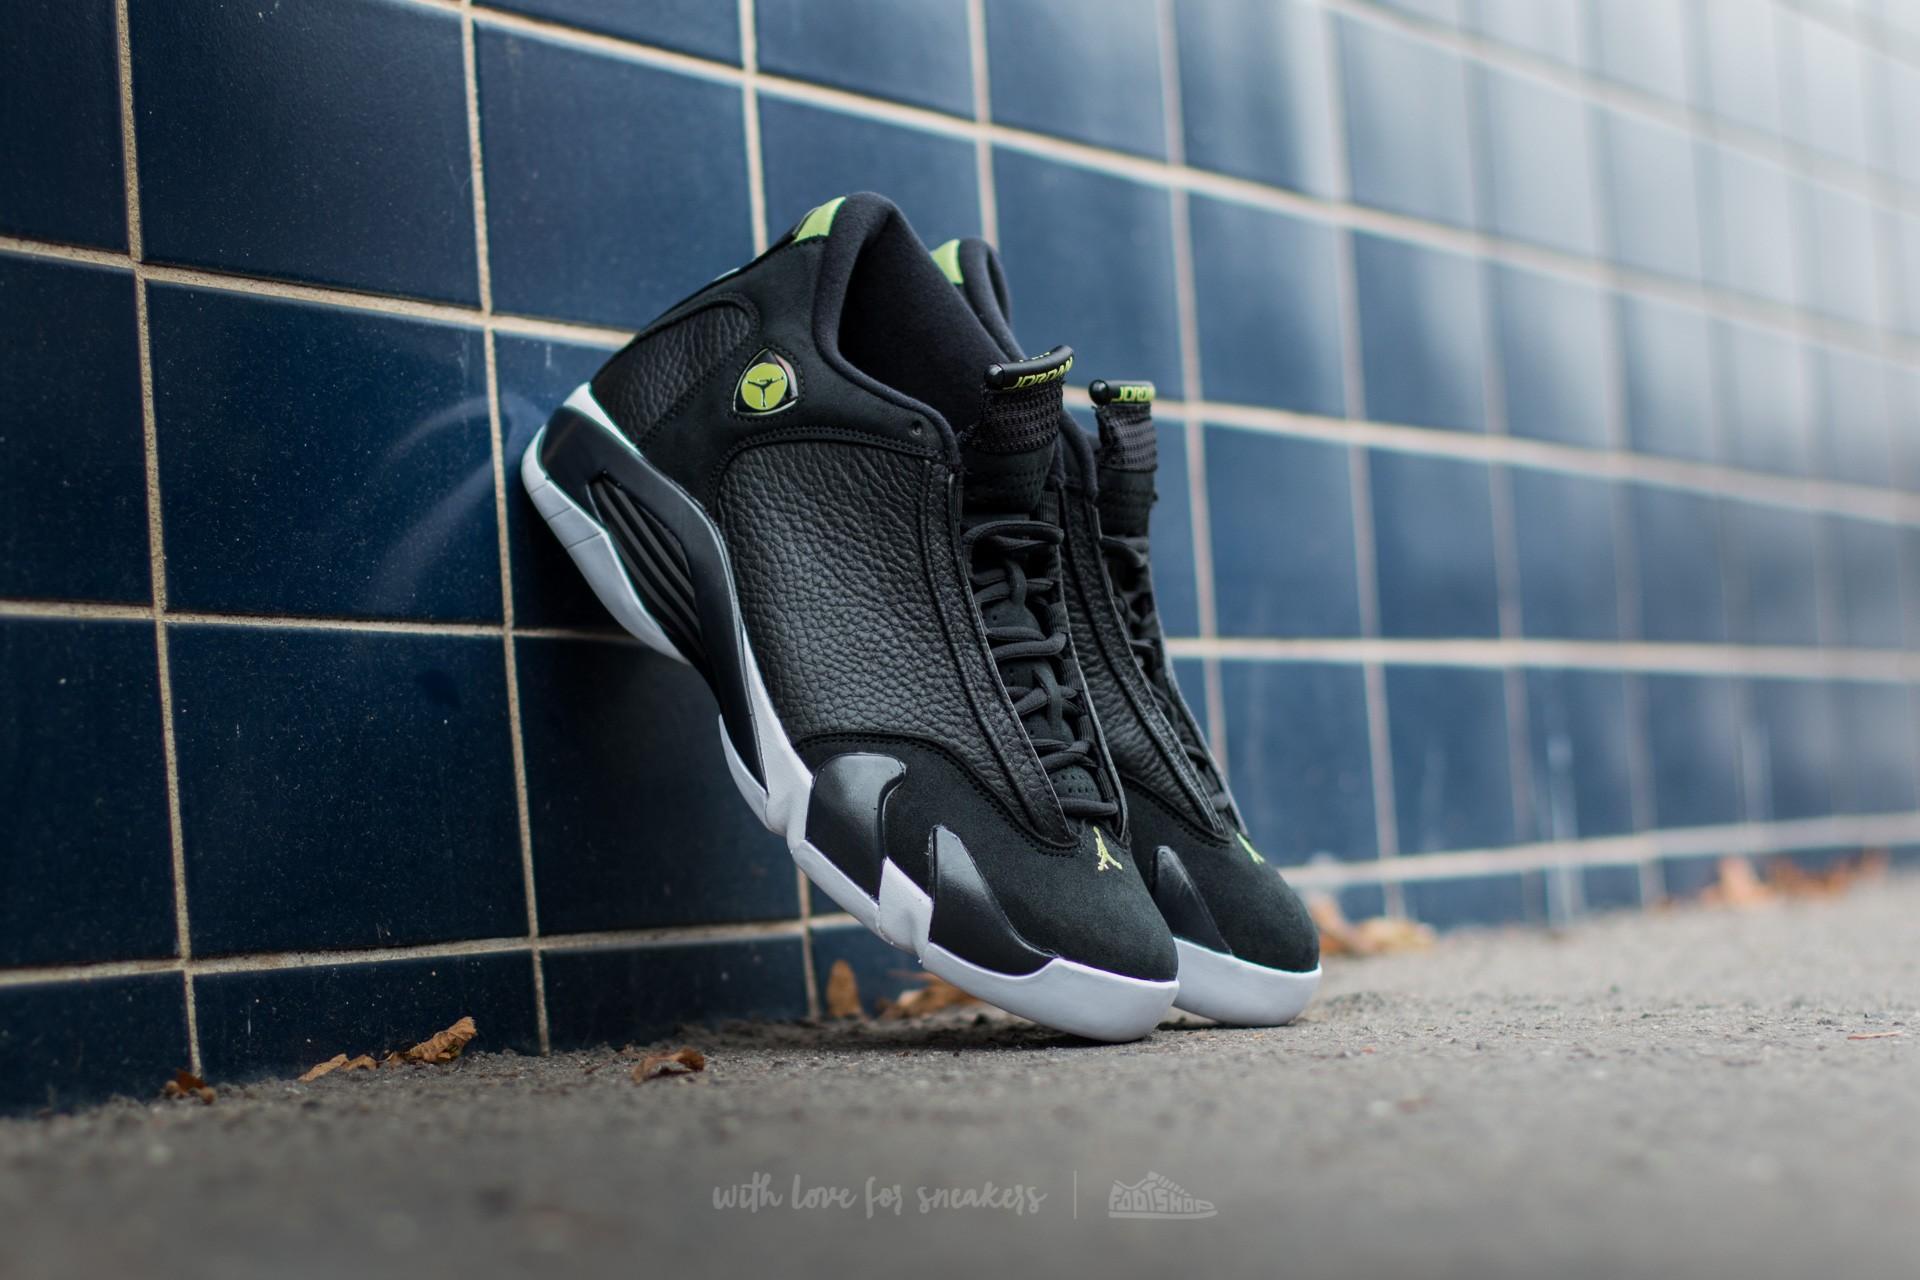 new product a8764 dbe37 Air Jordan 14 Retro. Black  Black-White-Vivid Green